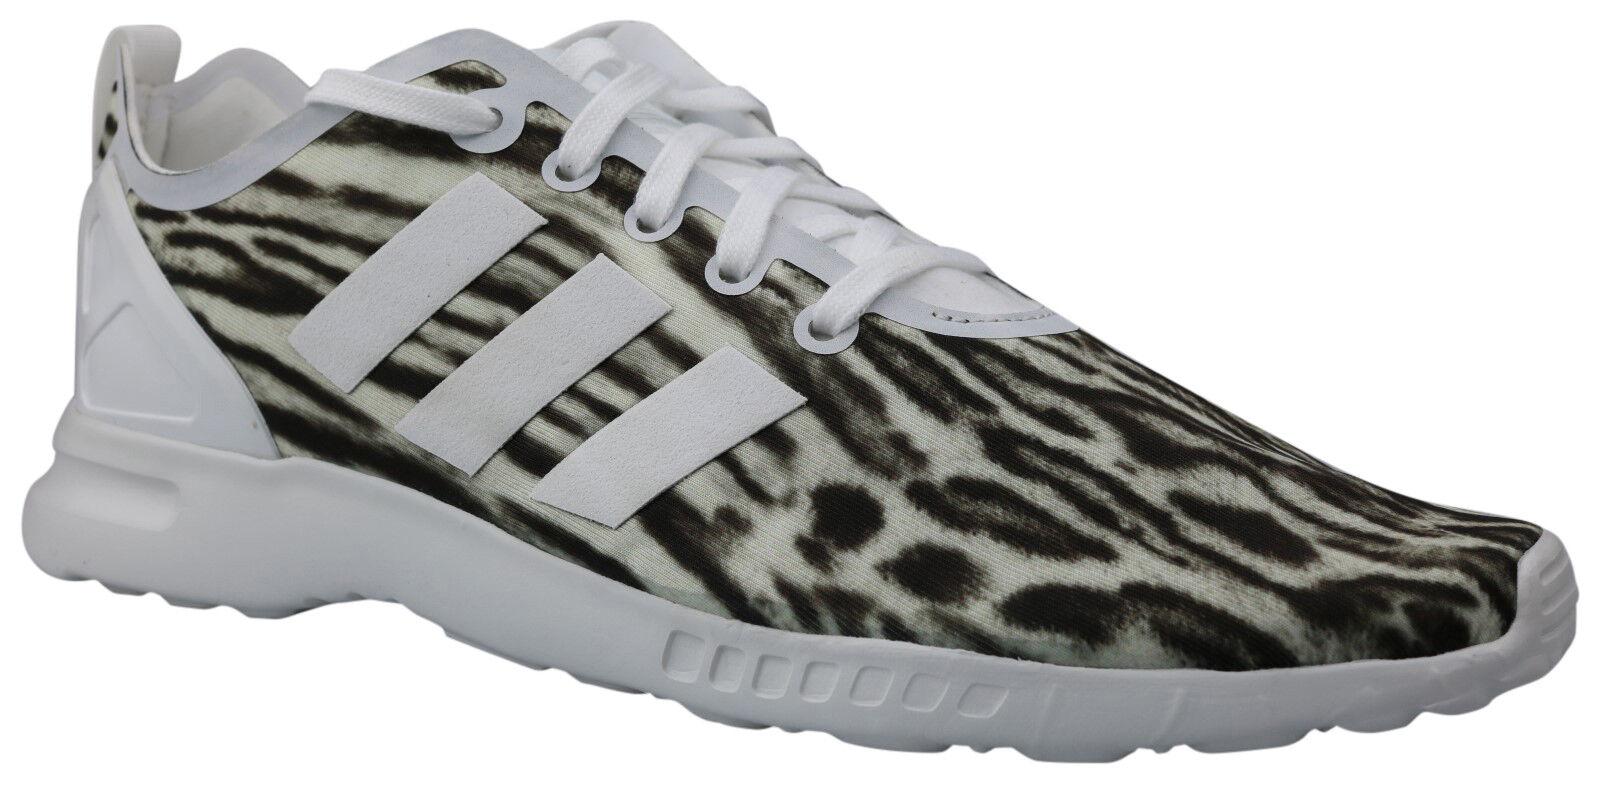 Adidas Originals ZX Flux ADV Smooth Torsion Sneaker AQ5645 Gr 36 - 40 NEU OVP